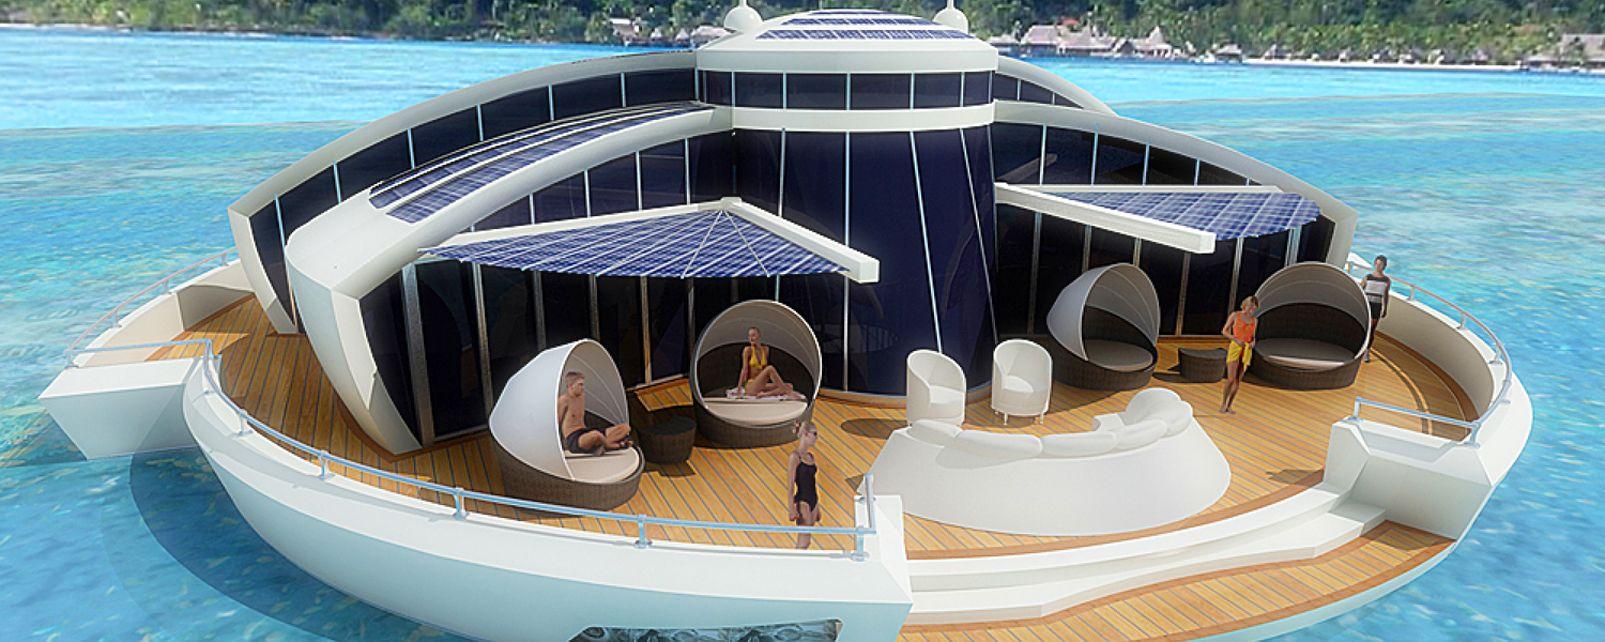 Hôtel Solar Floating Island